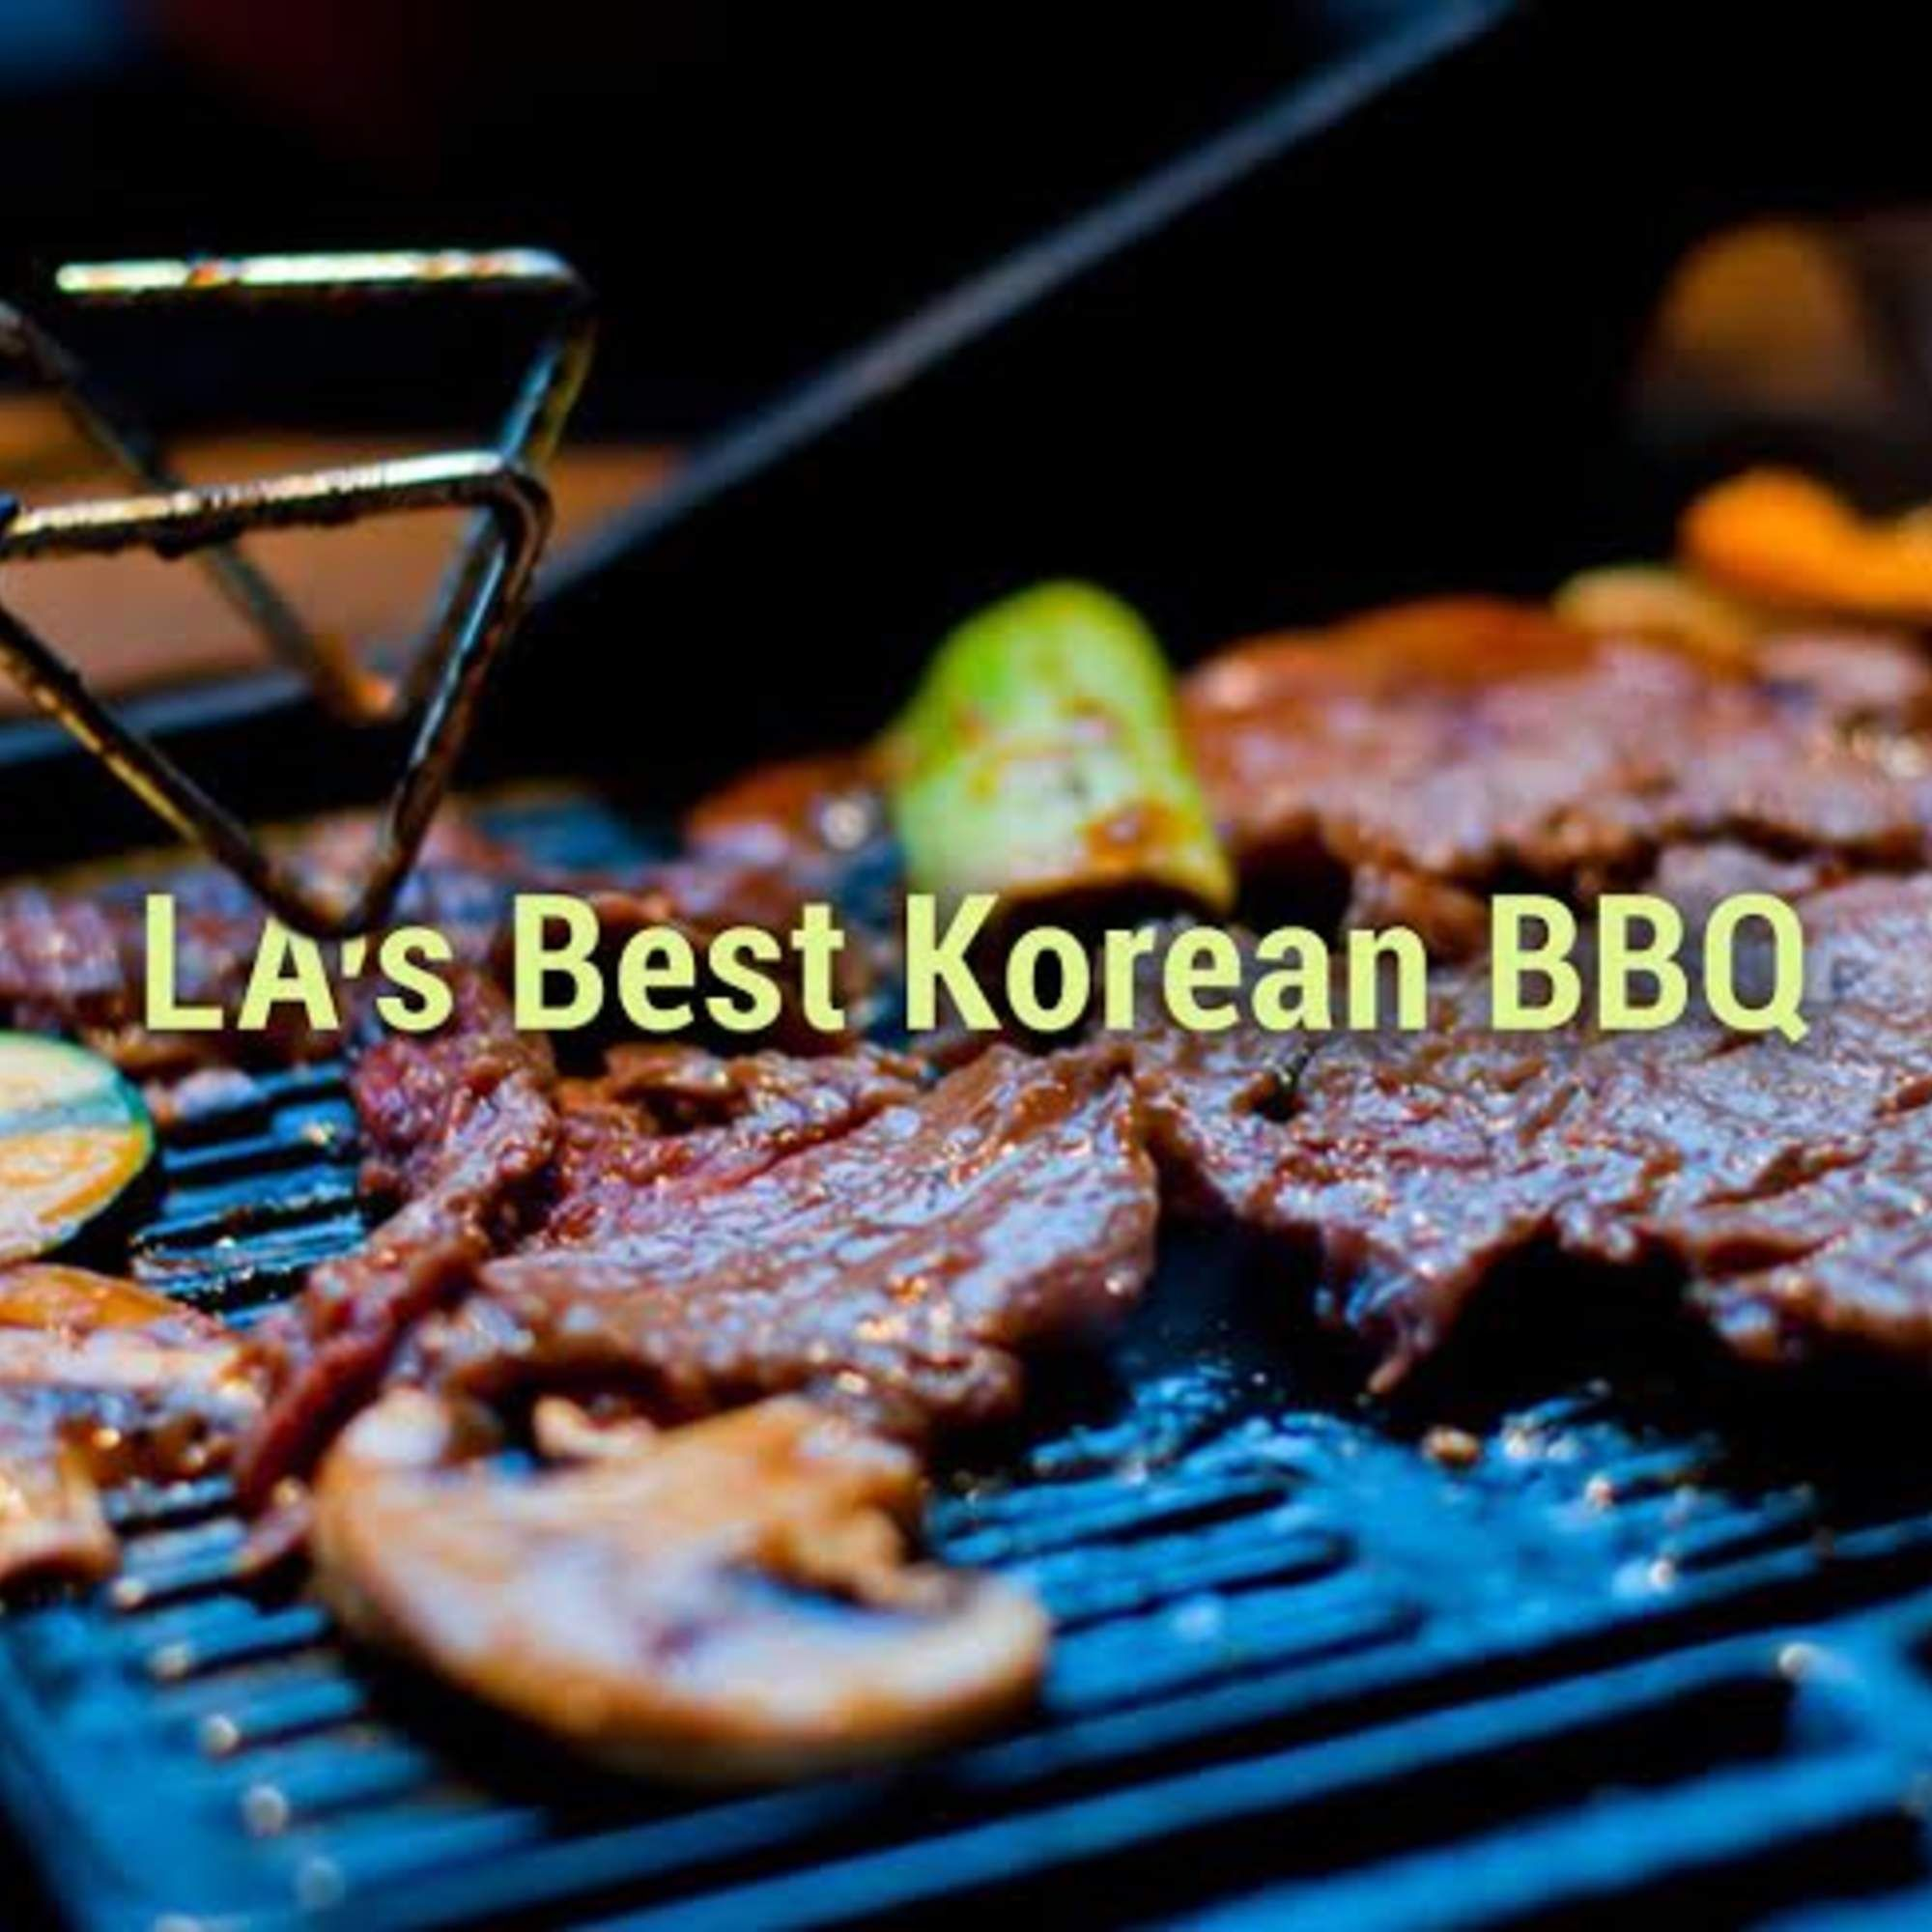 La S Best Korean Bbq Spots Best Korean Bbq Korean Bbq Foodie Travel